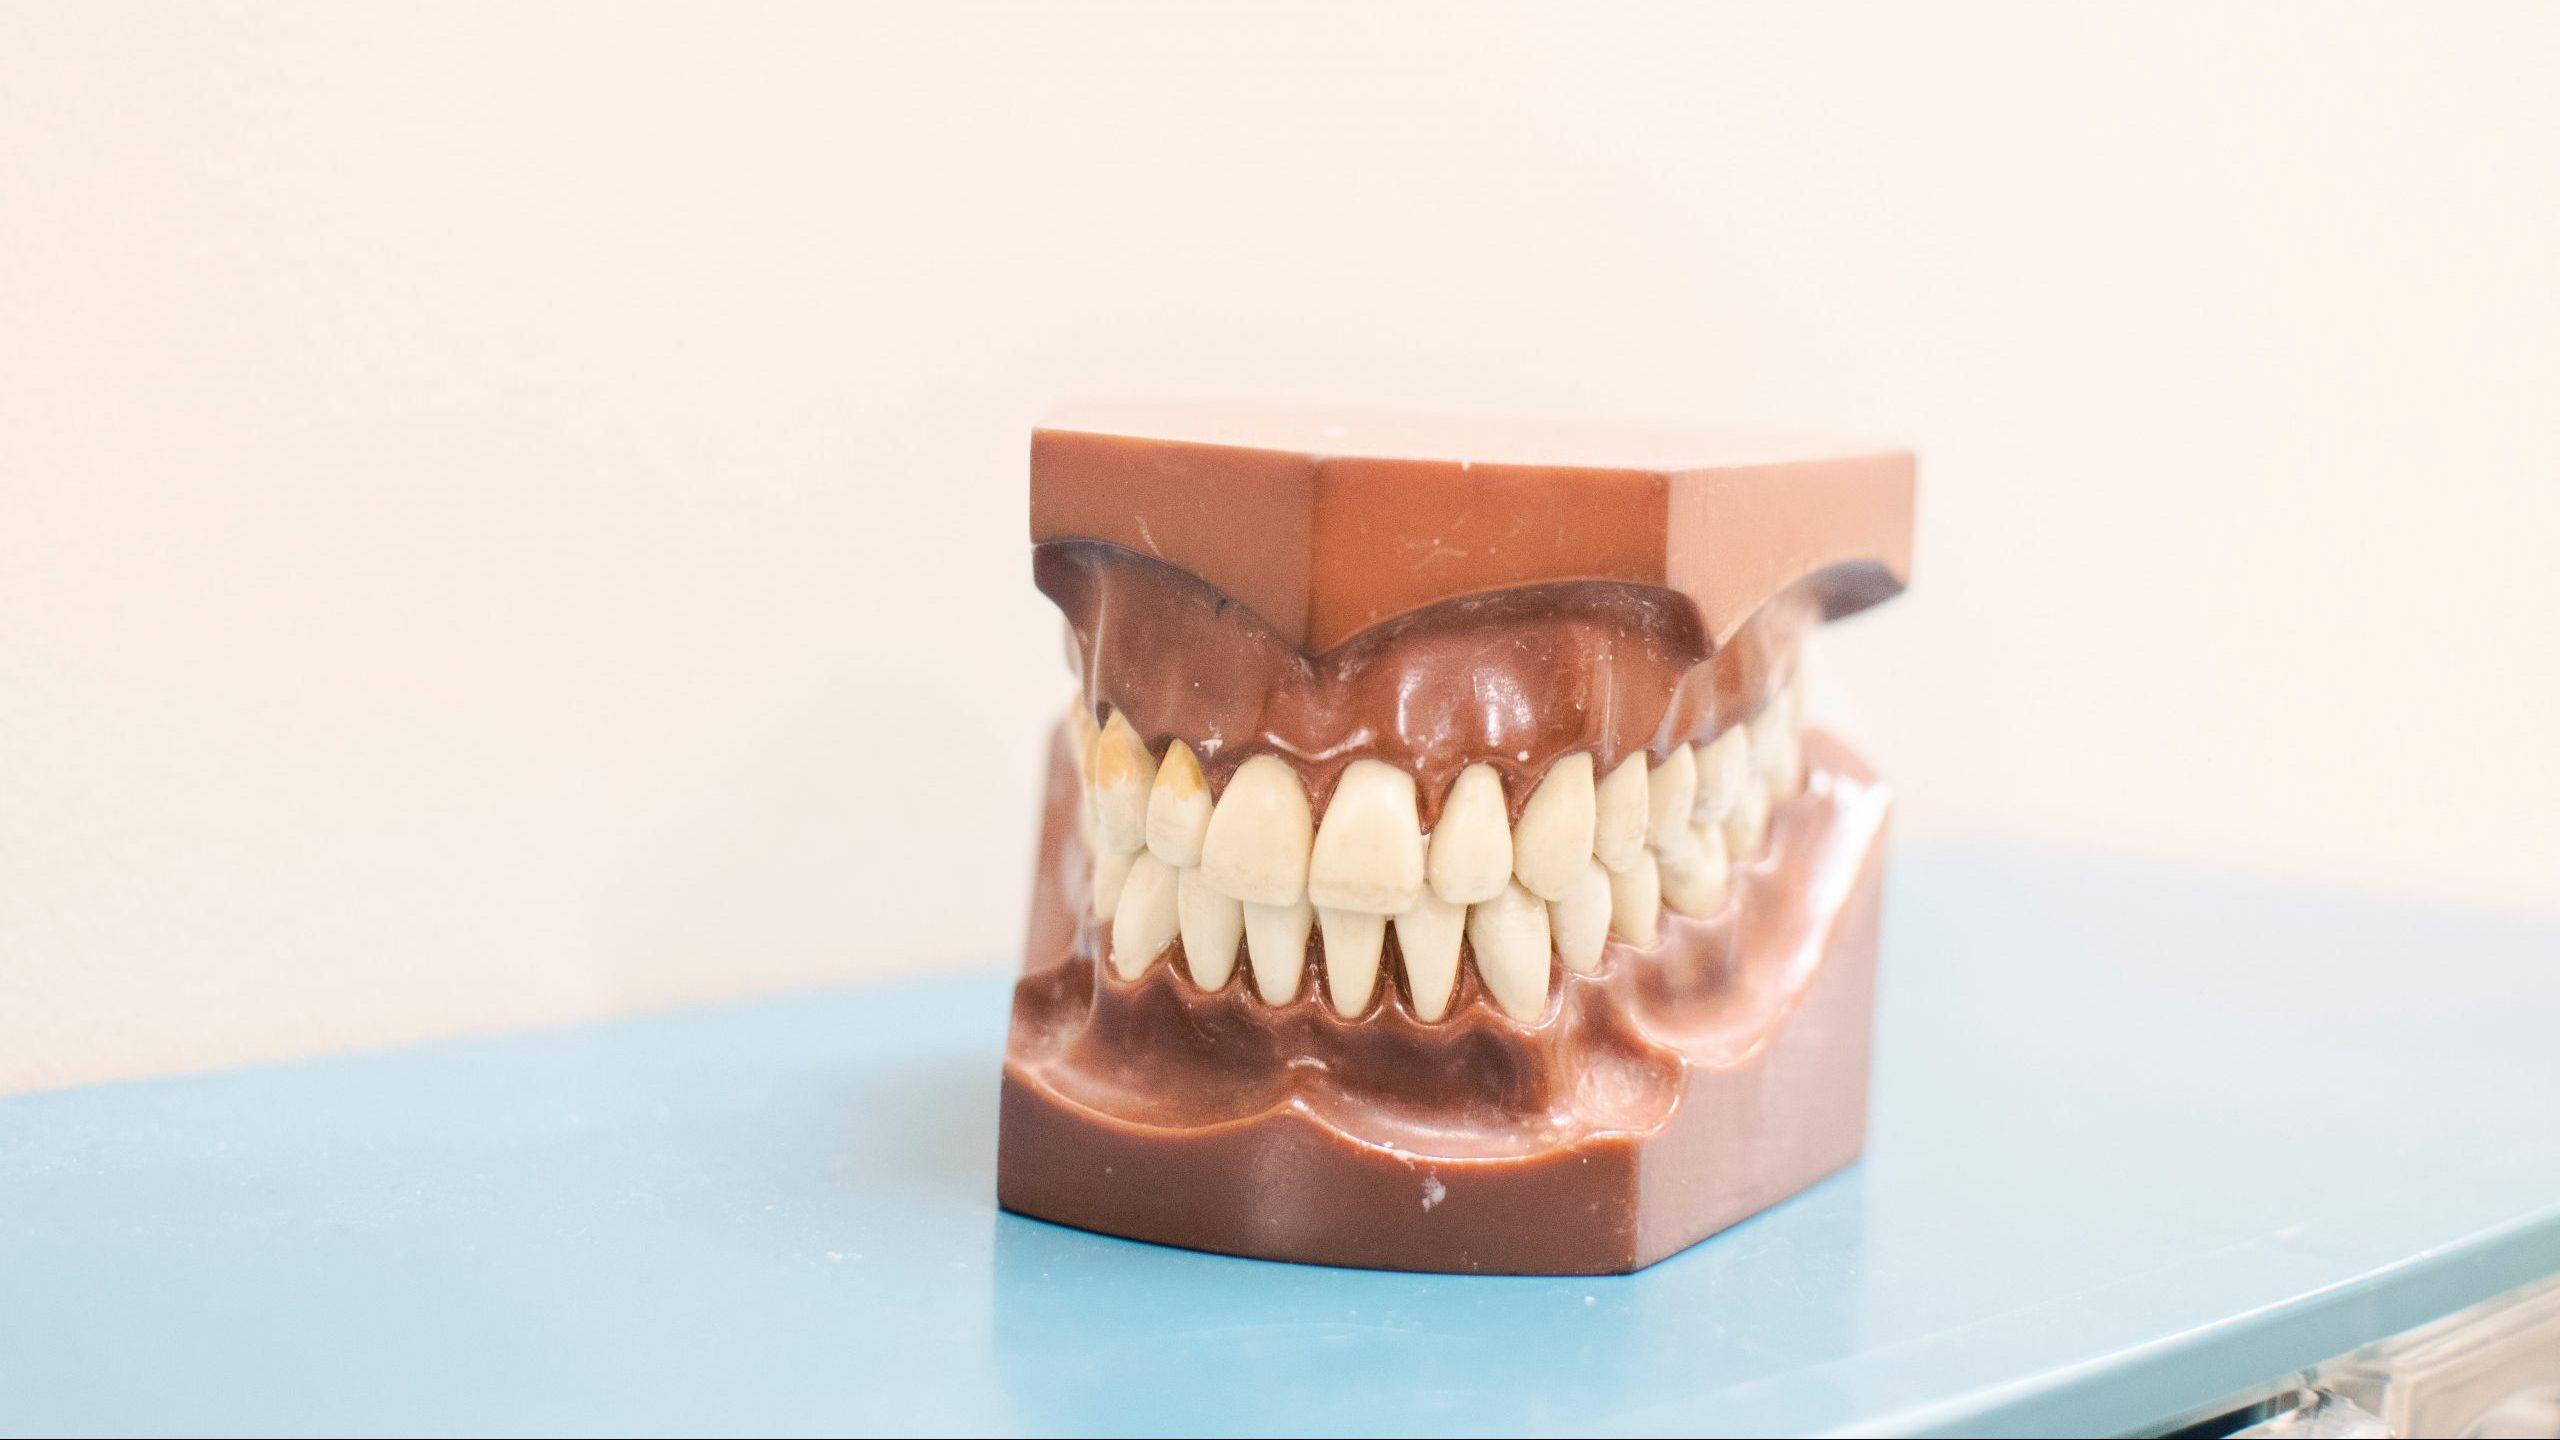 Fluoride, Teeth, & The Atomic Bomb